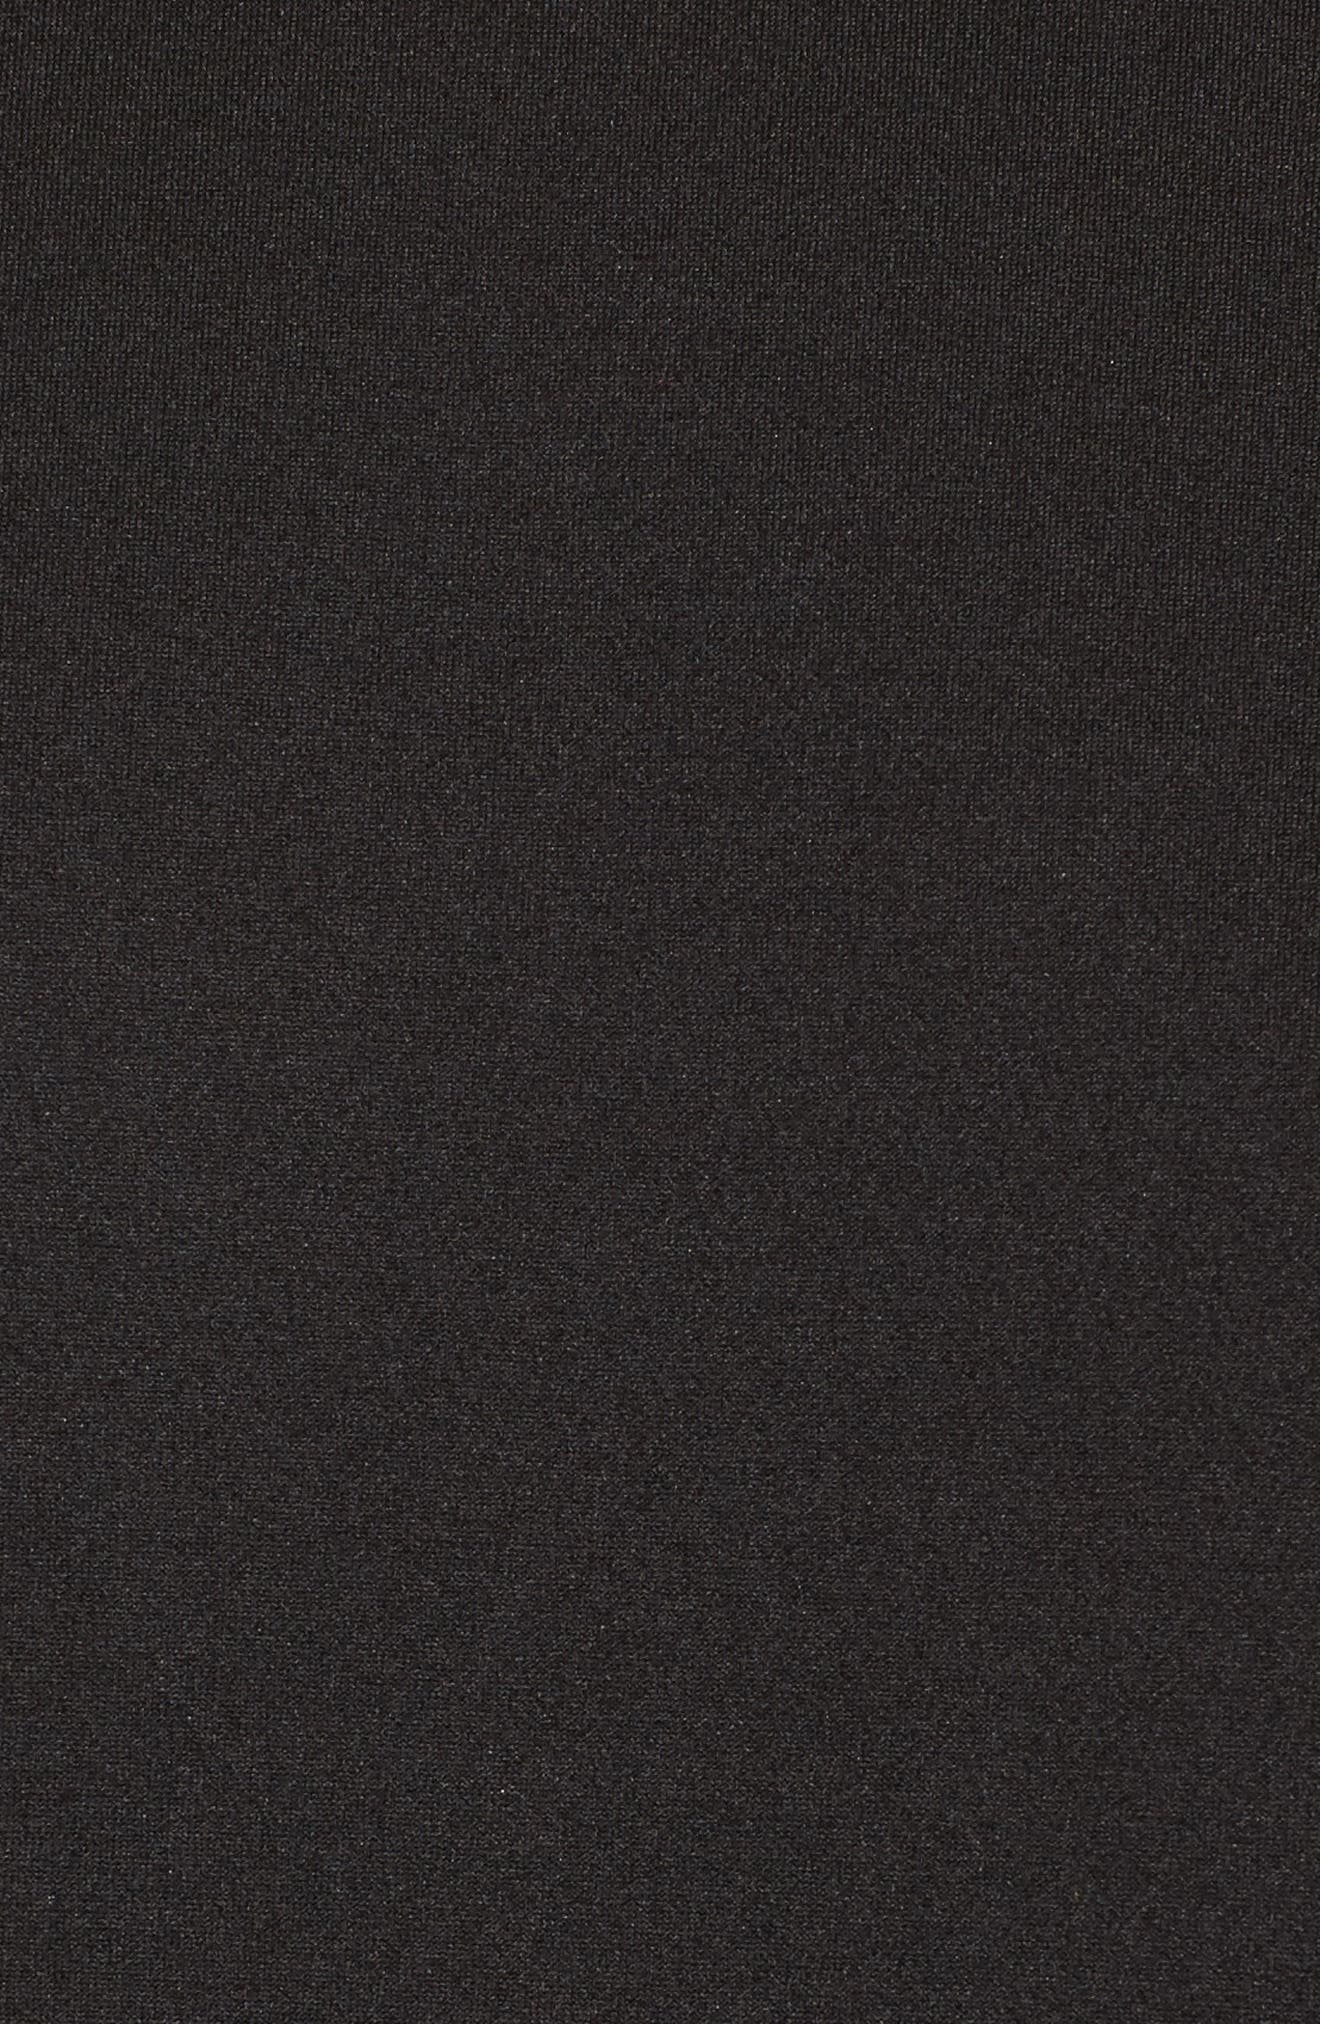 Neoprene Drama Sleeve Top,                             Alternate thumbnail 5, color,                             Black